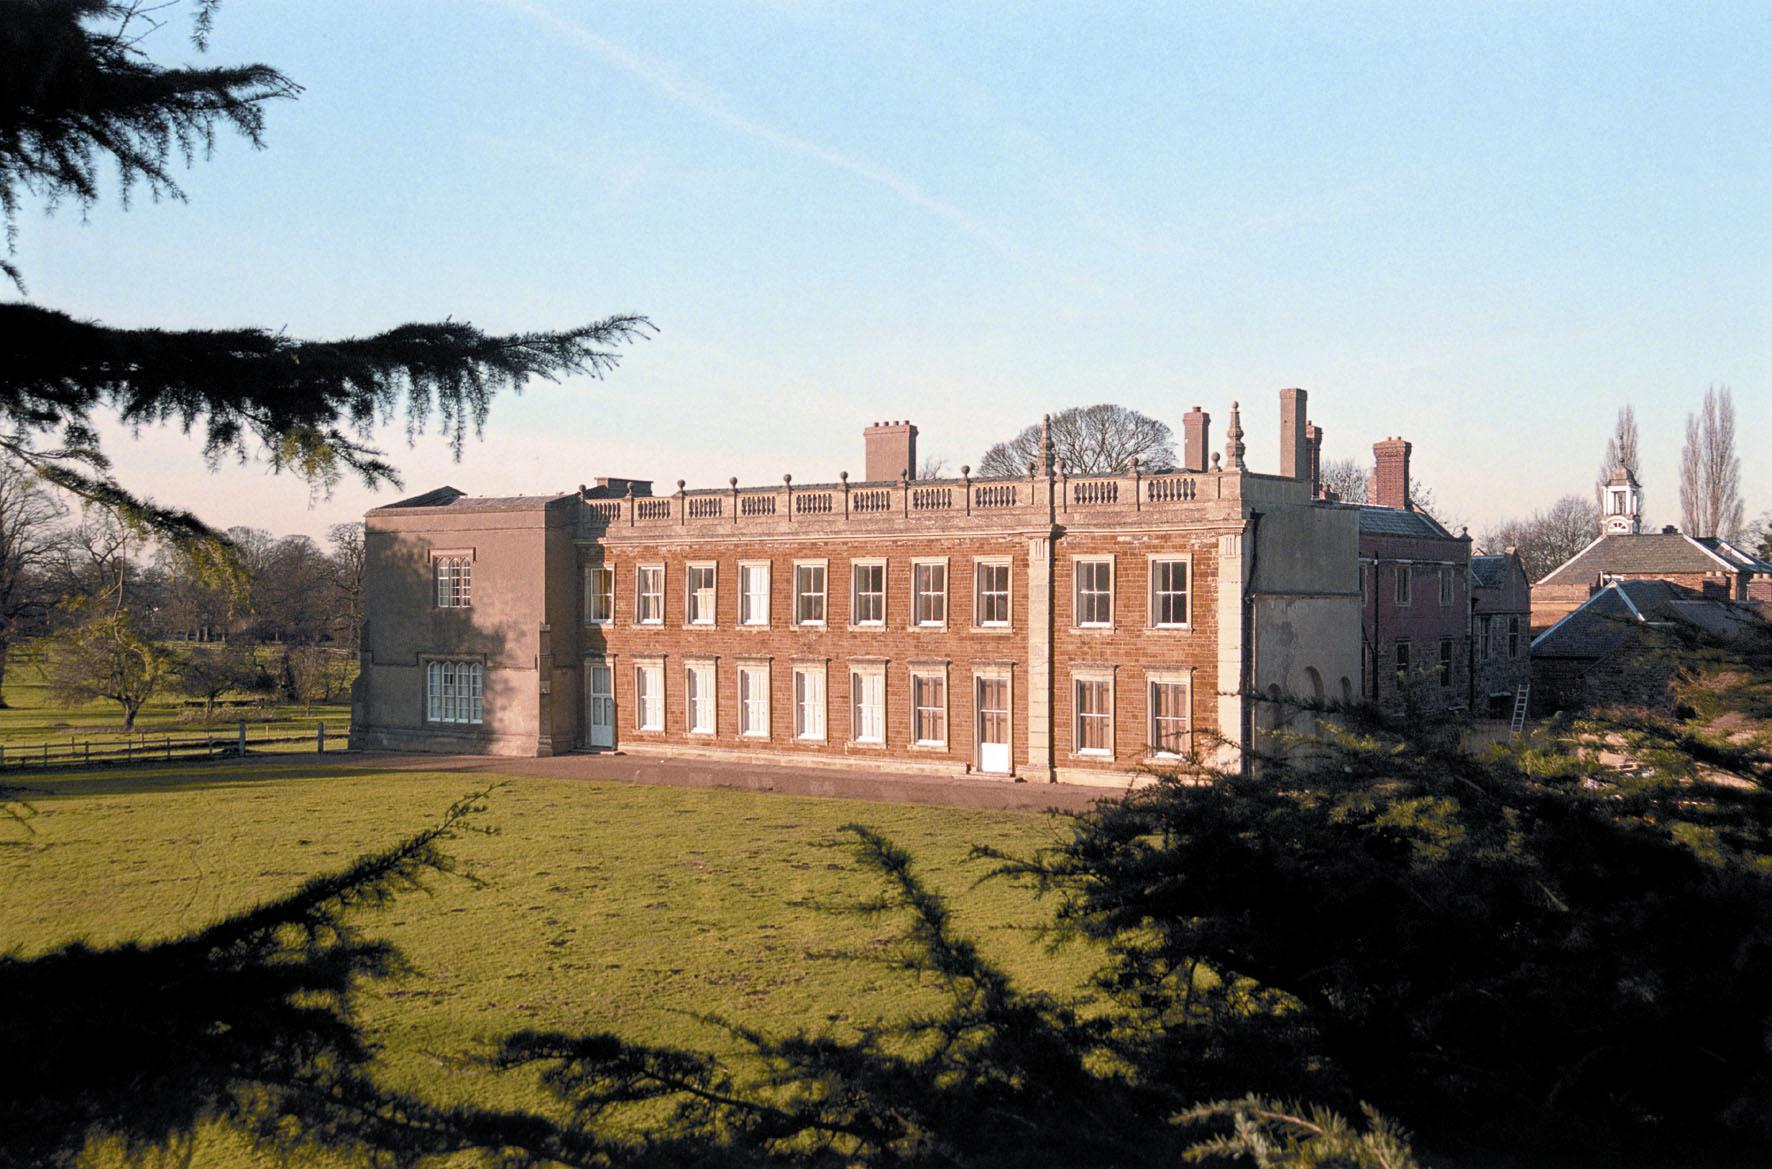 Delapre Abbey U2013 Preserving 900 Years Of History